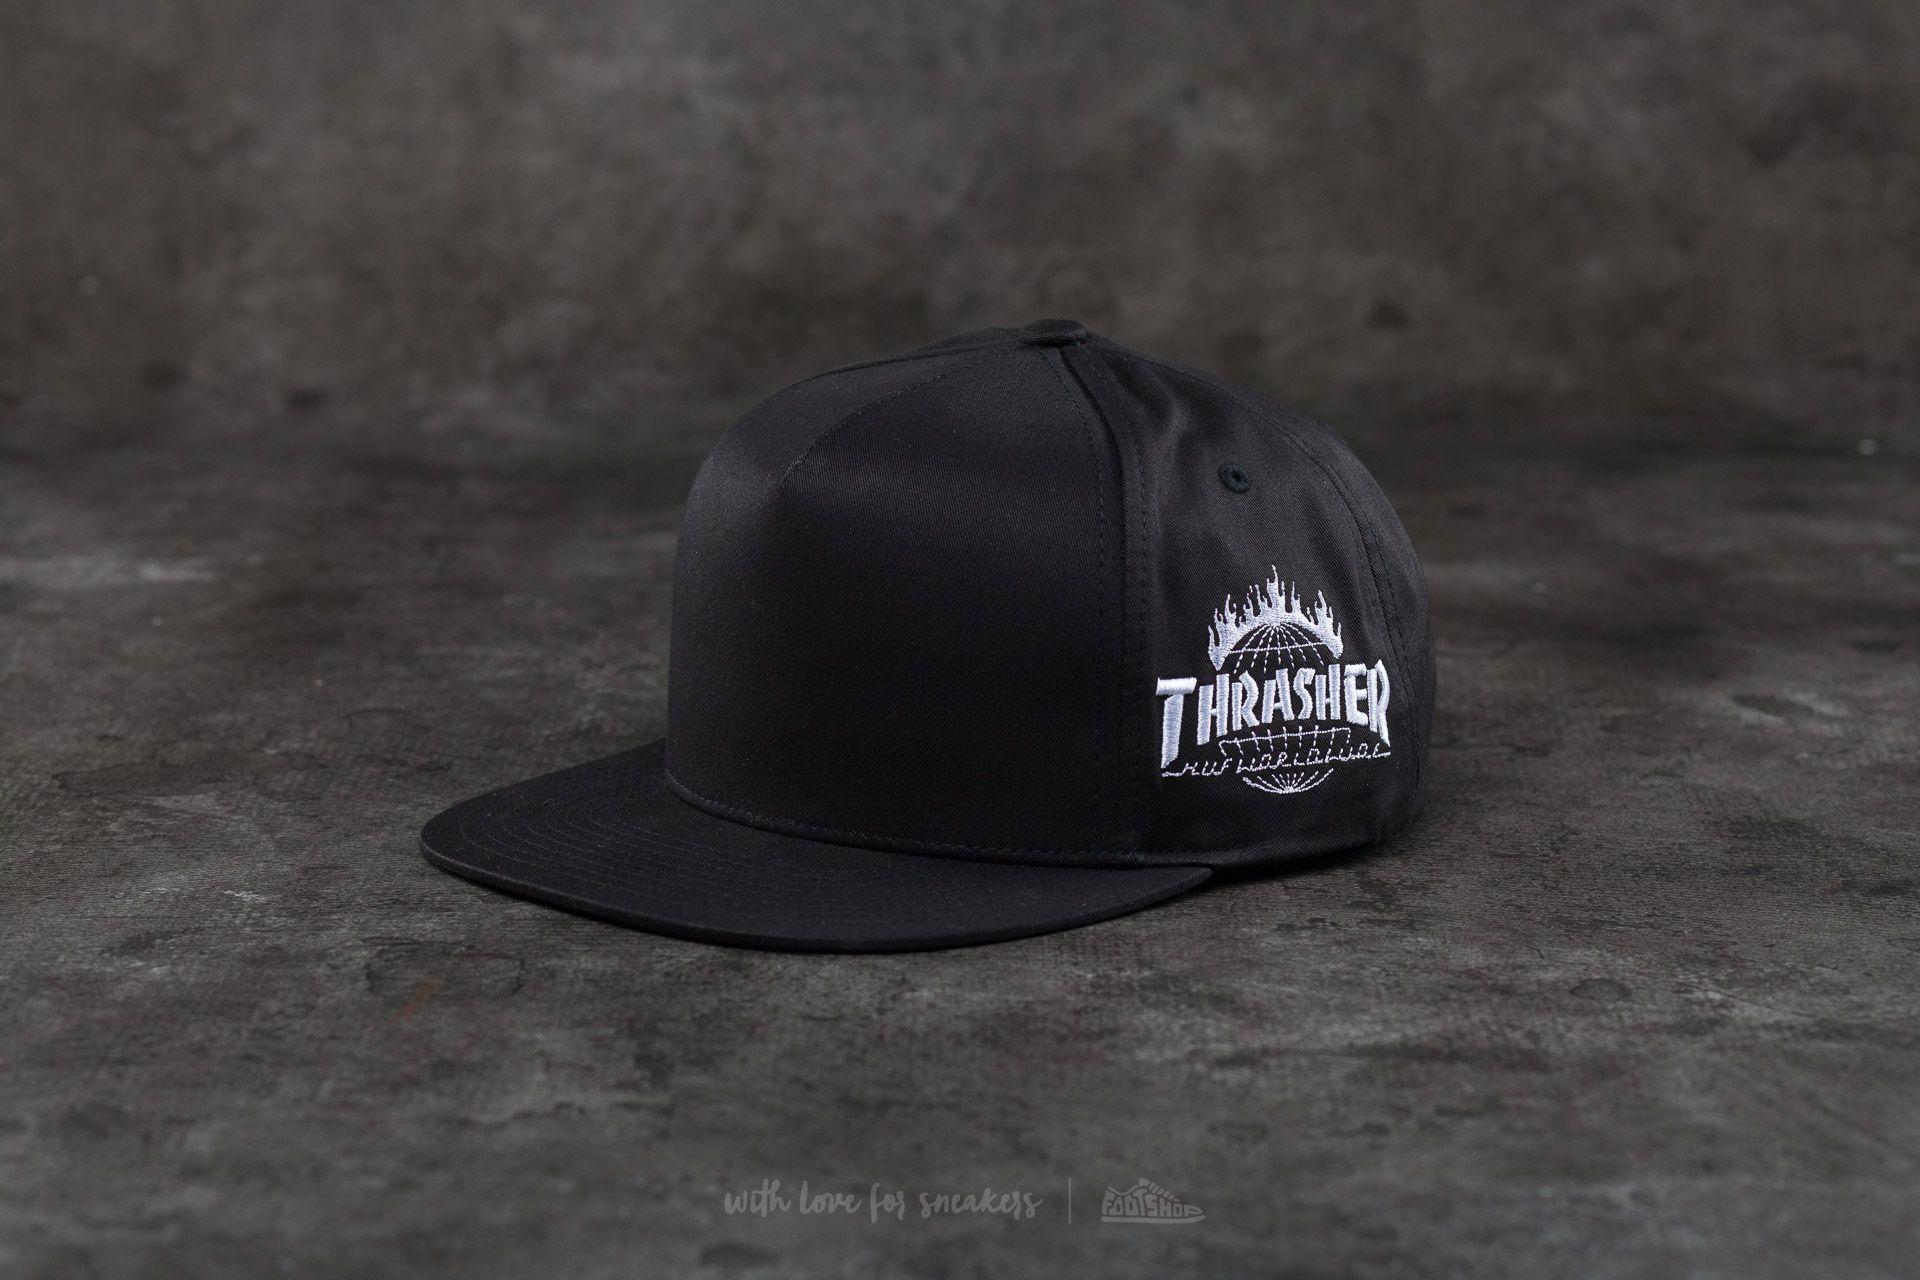 HUF x Thrasher Tour De Stoops Snapback Black